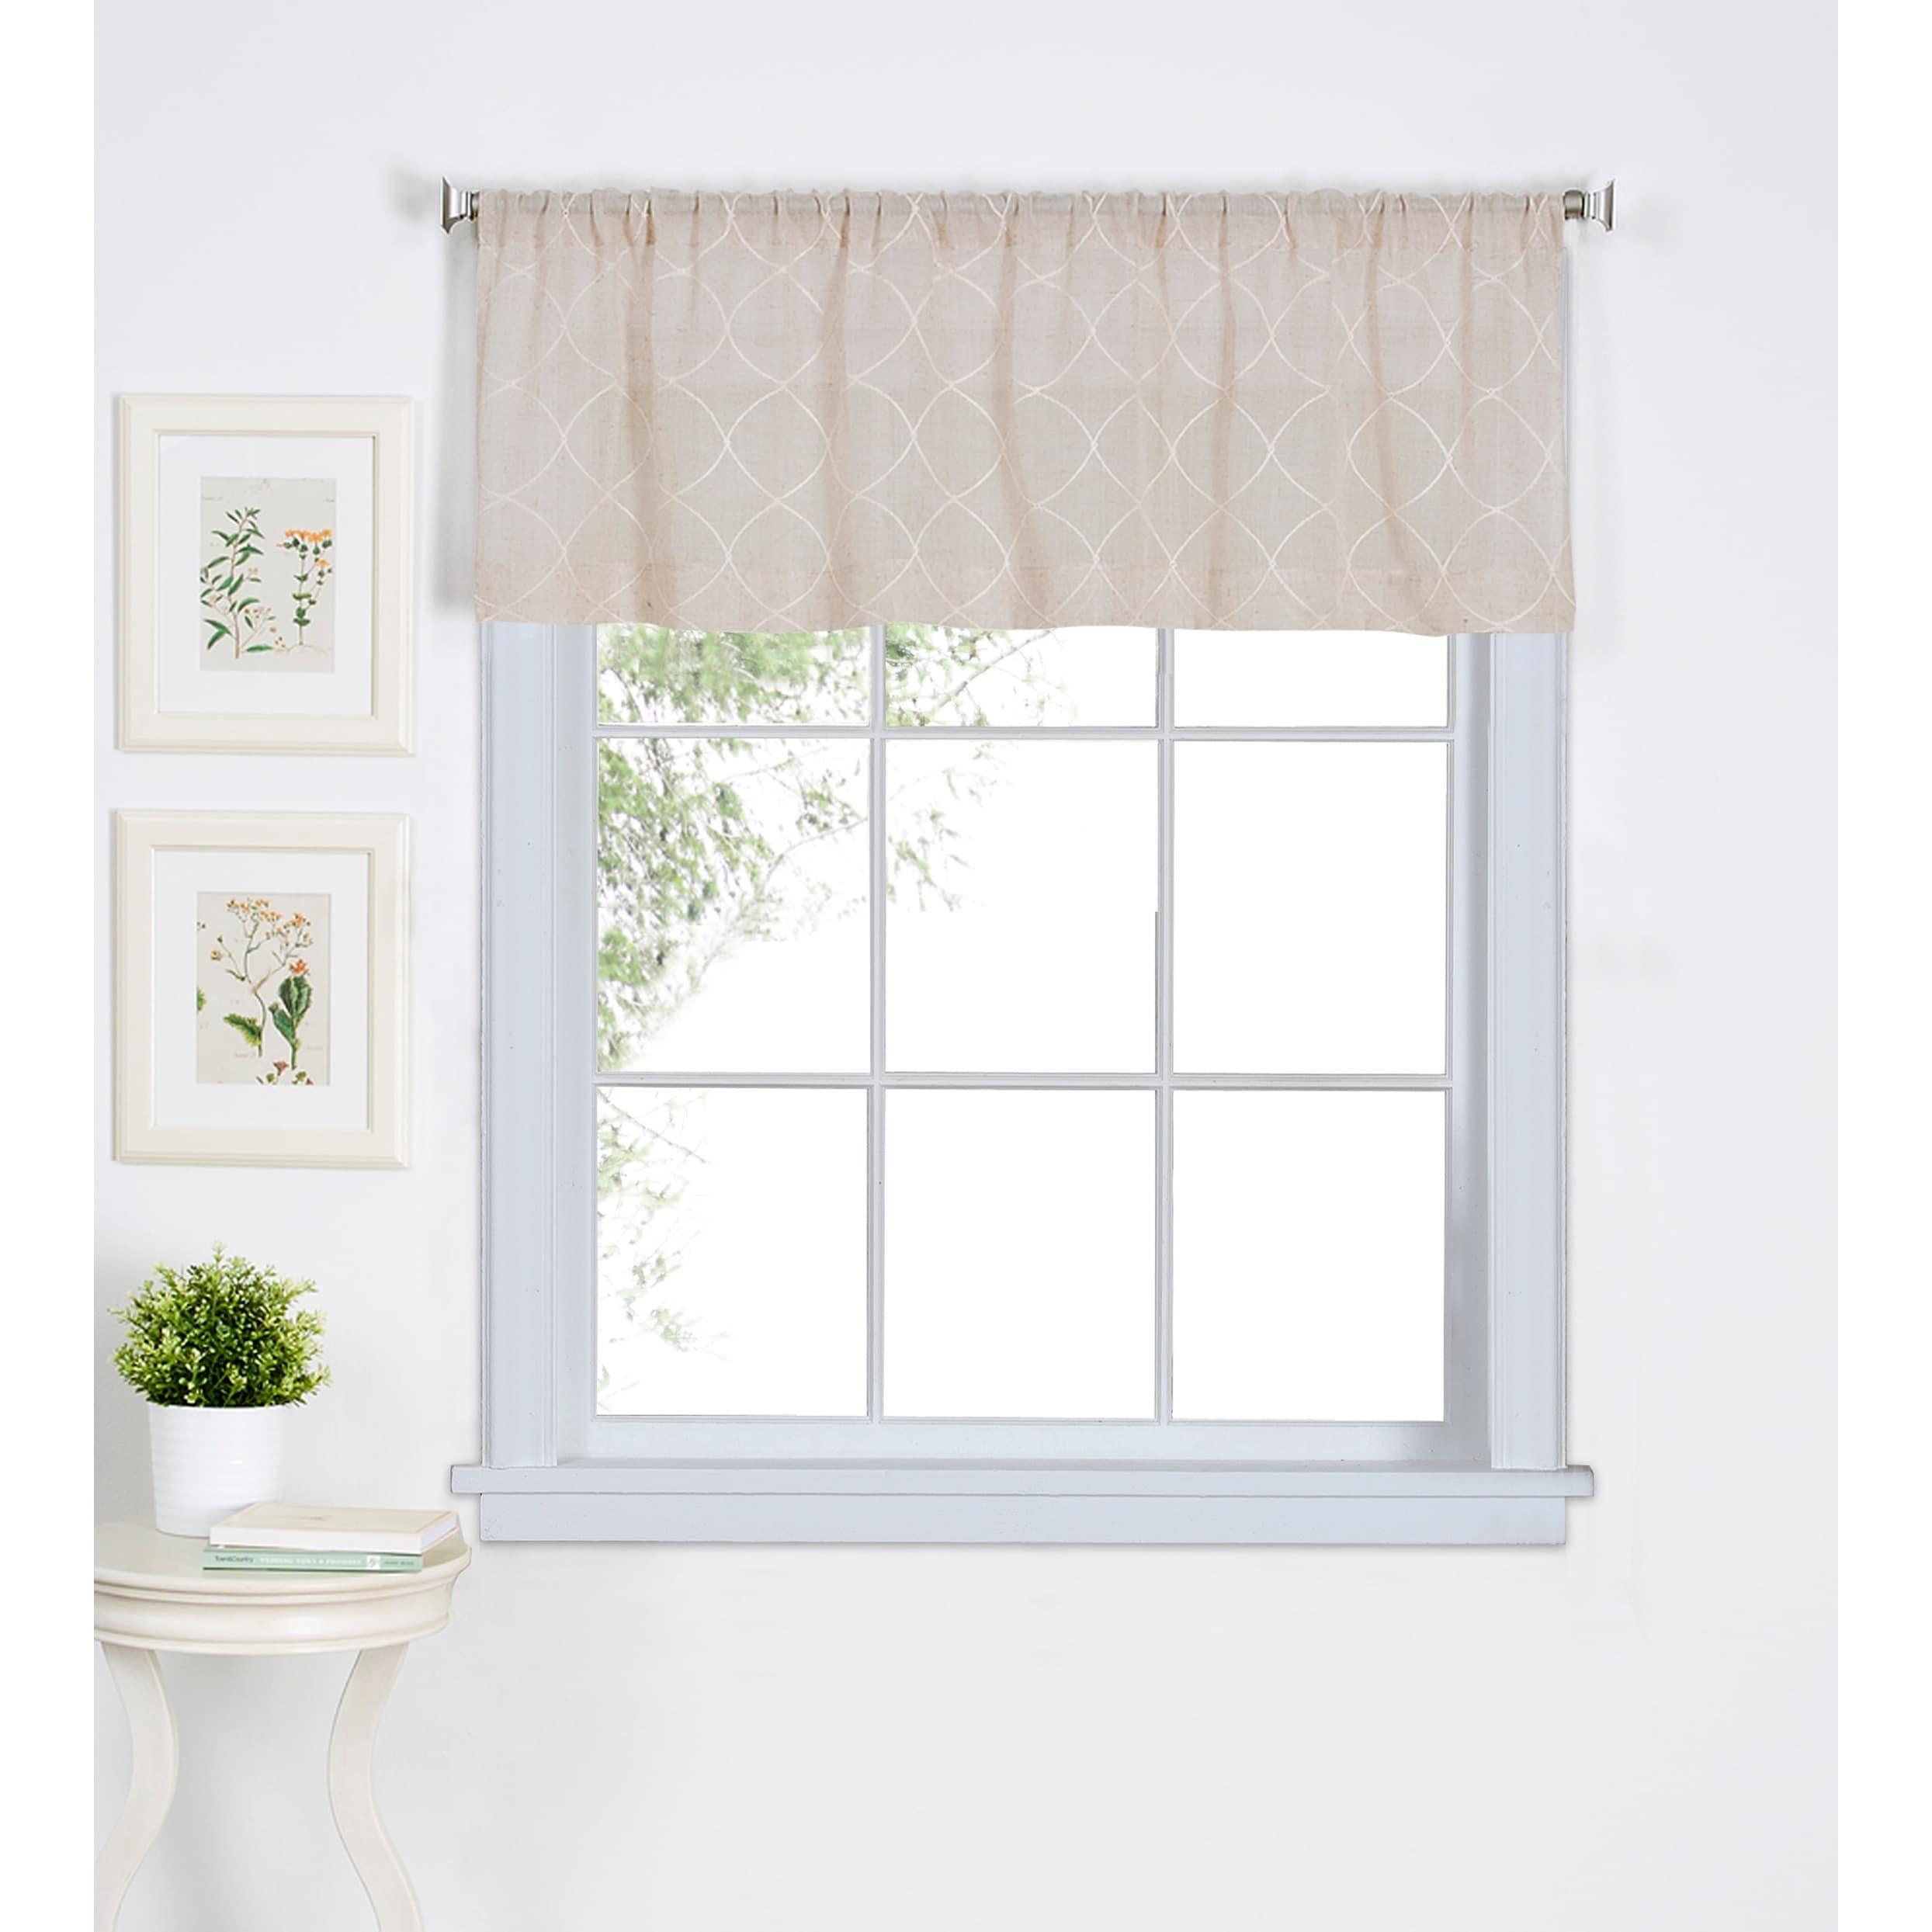 Elrene Taylor Kitchen Window Valance